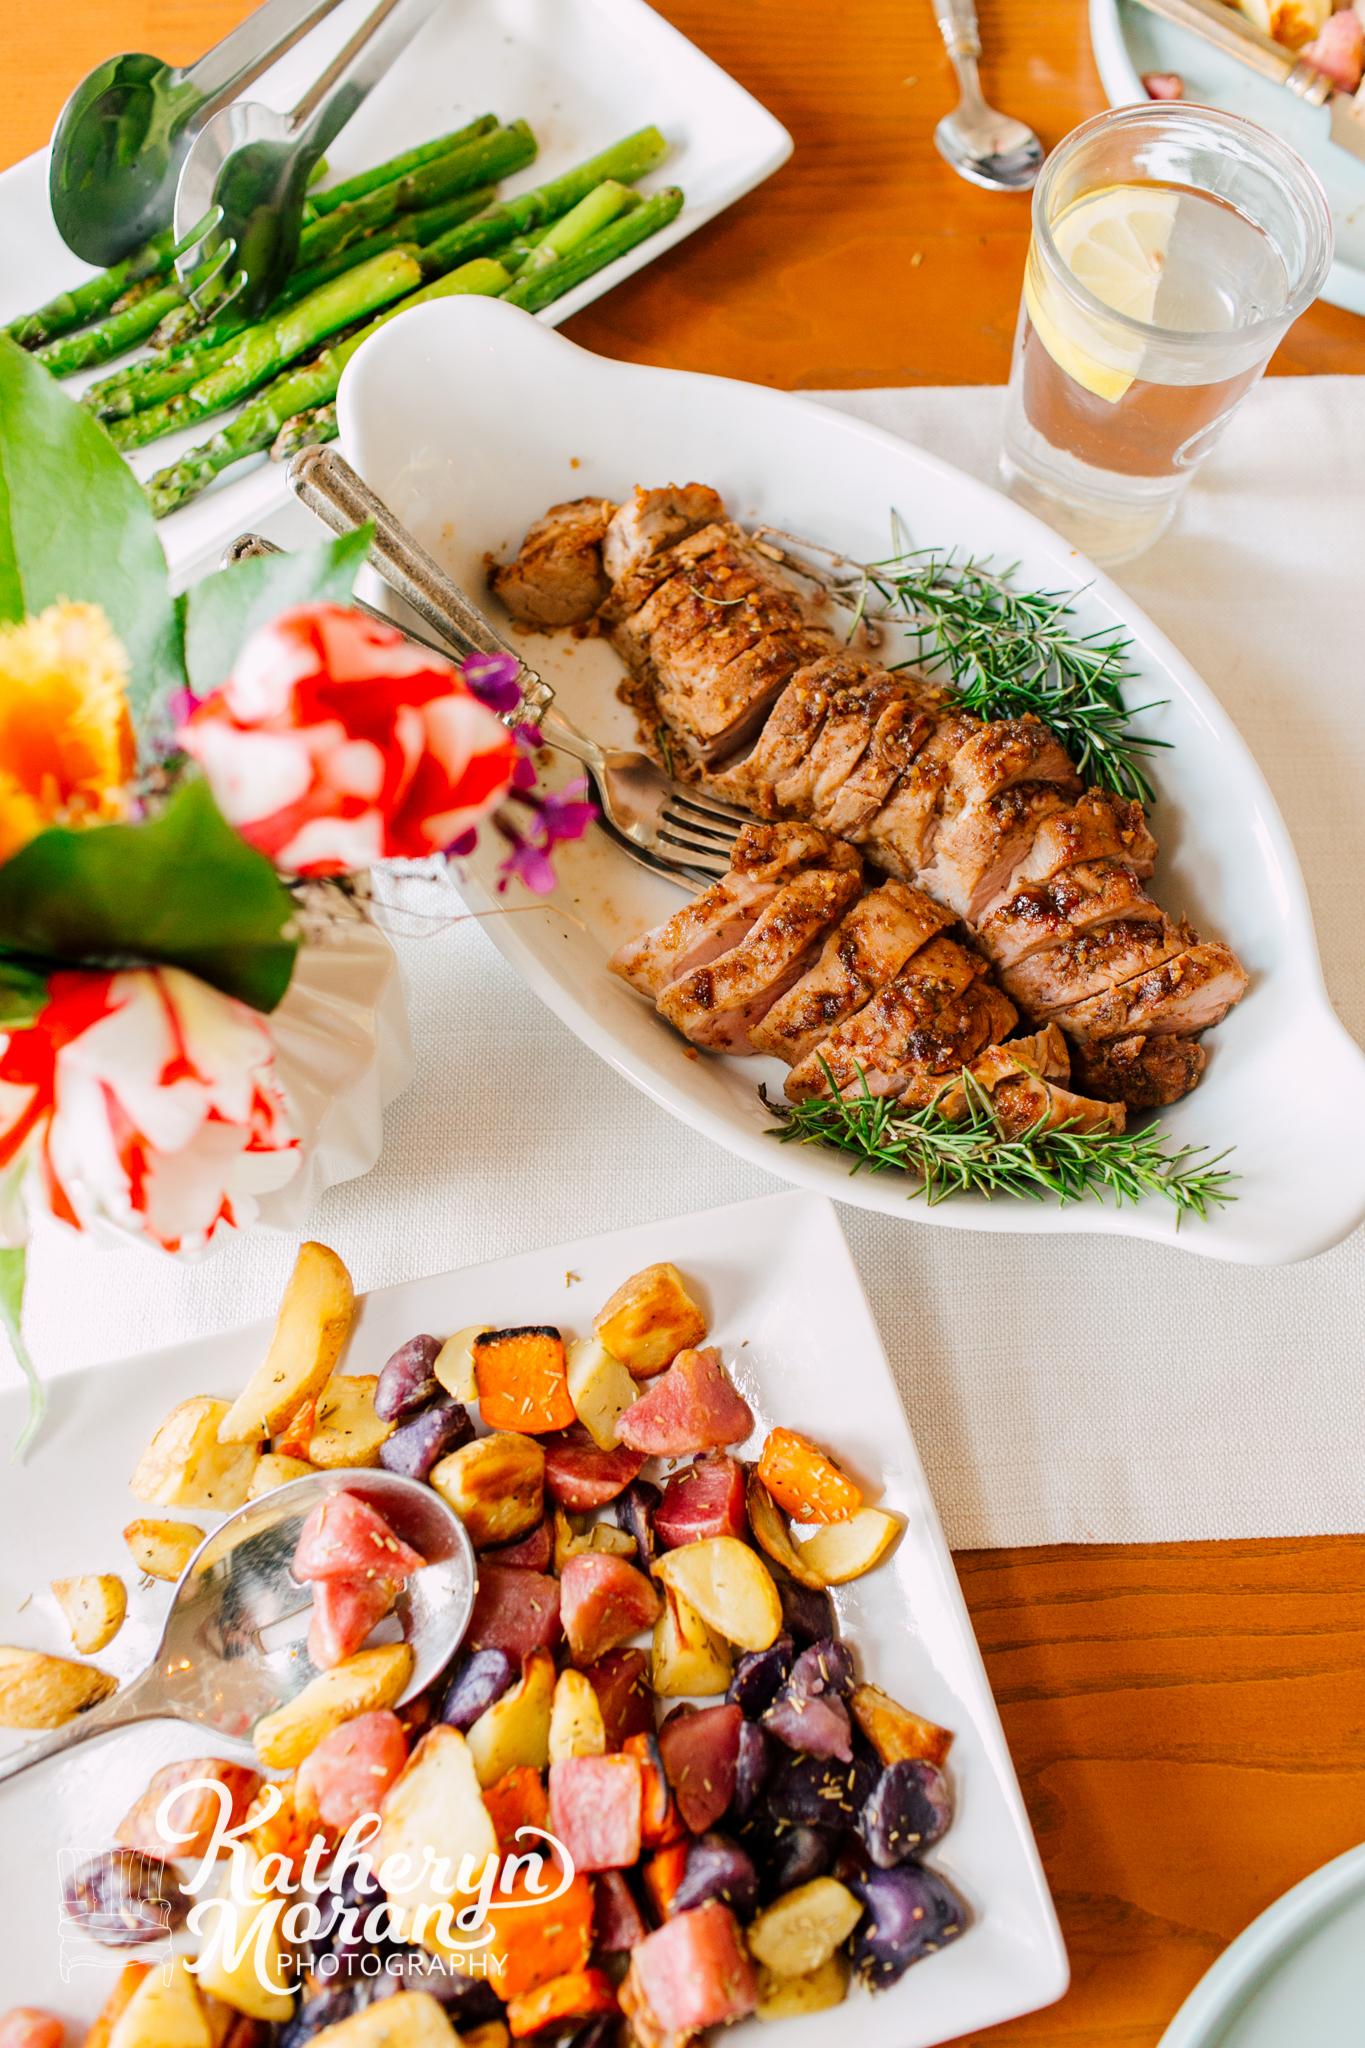 dream-dinners-lifestyle-session-katheryn-moran-2019-2.jpg